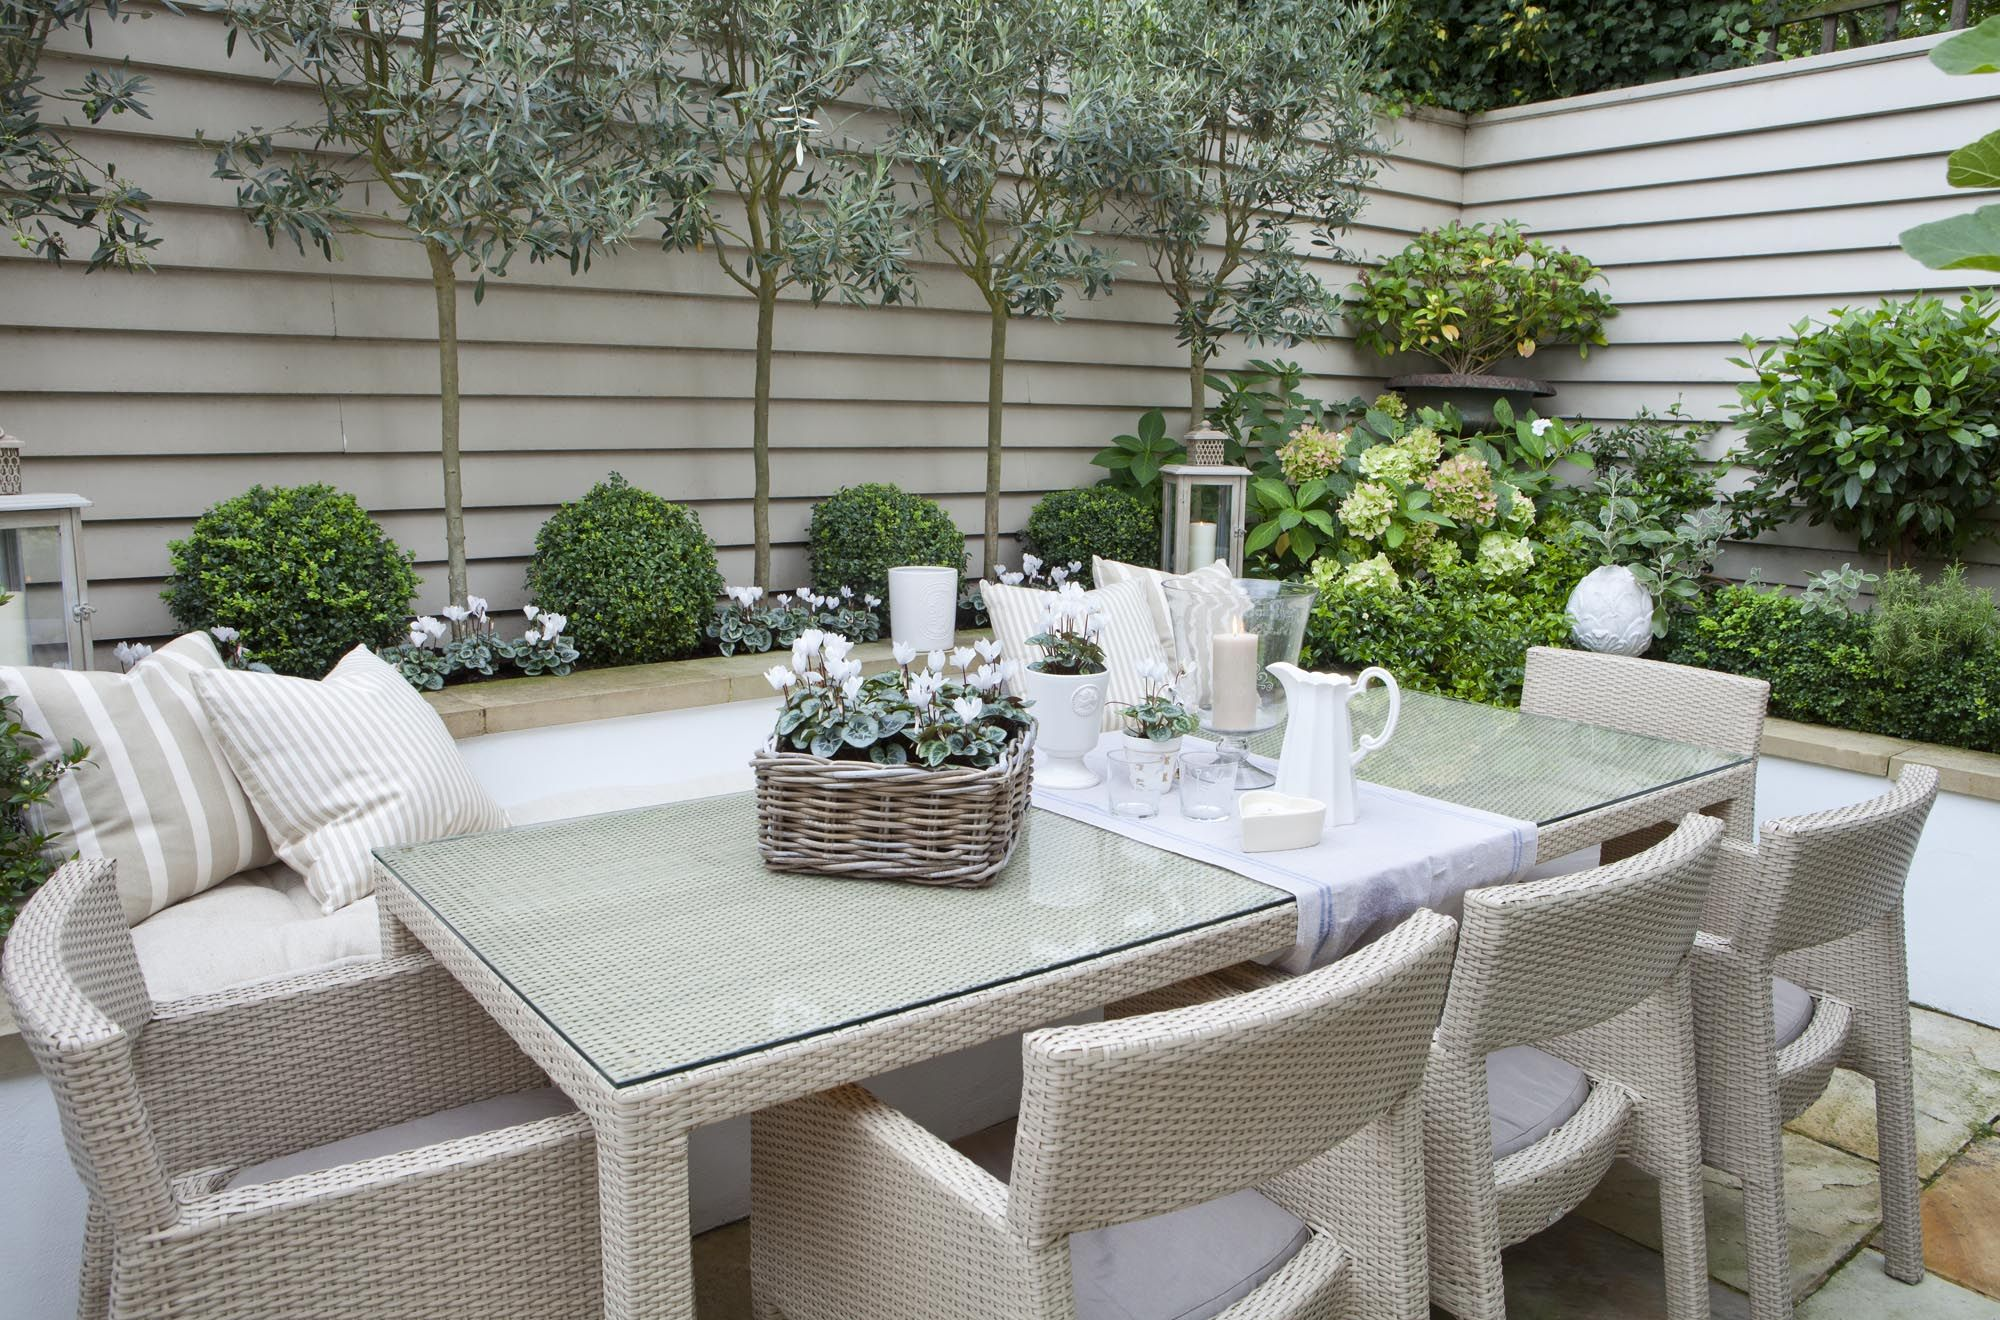 Leopoldina Haynes Garden olive trees and dining outdoor, love the walls Outdoor landscape  ~ 22210404_Kleine Garten Modern Gestalten